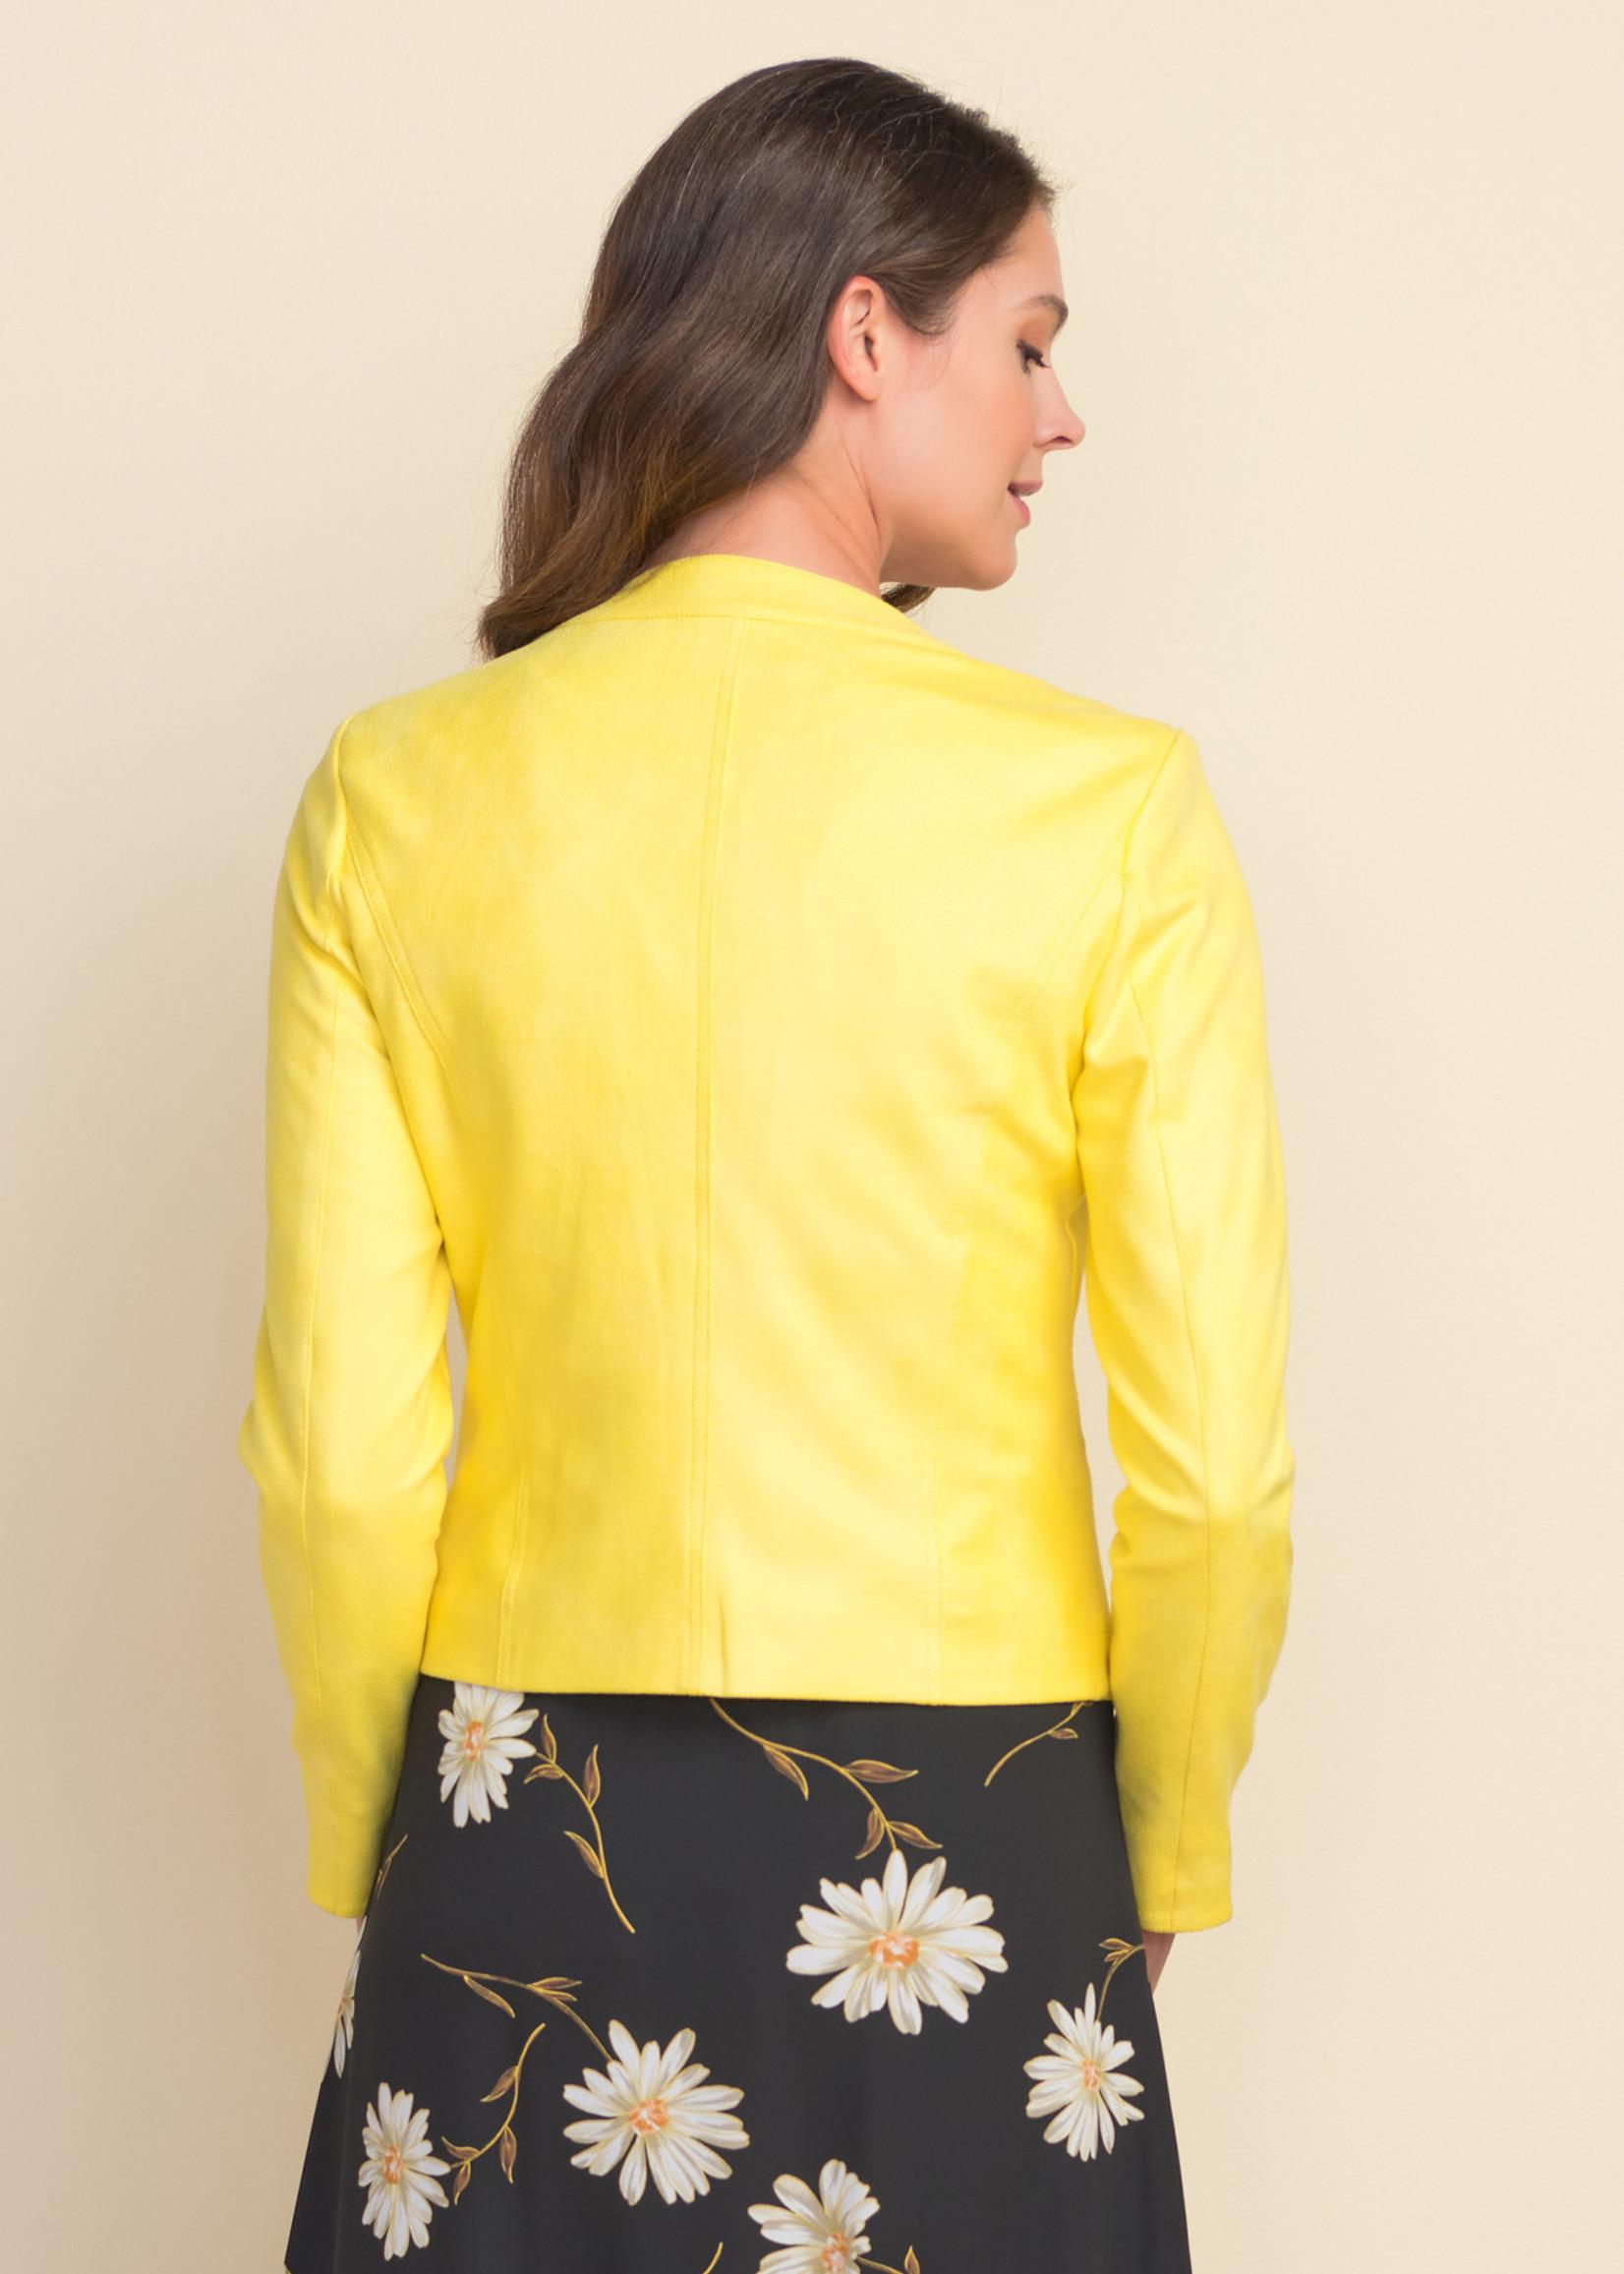 Joseph Ribkoff Joseph Ribkoff Moto Jacket with Grommets